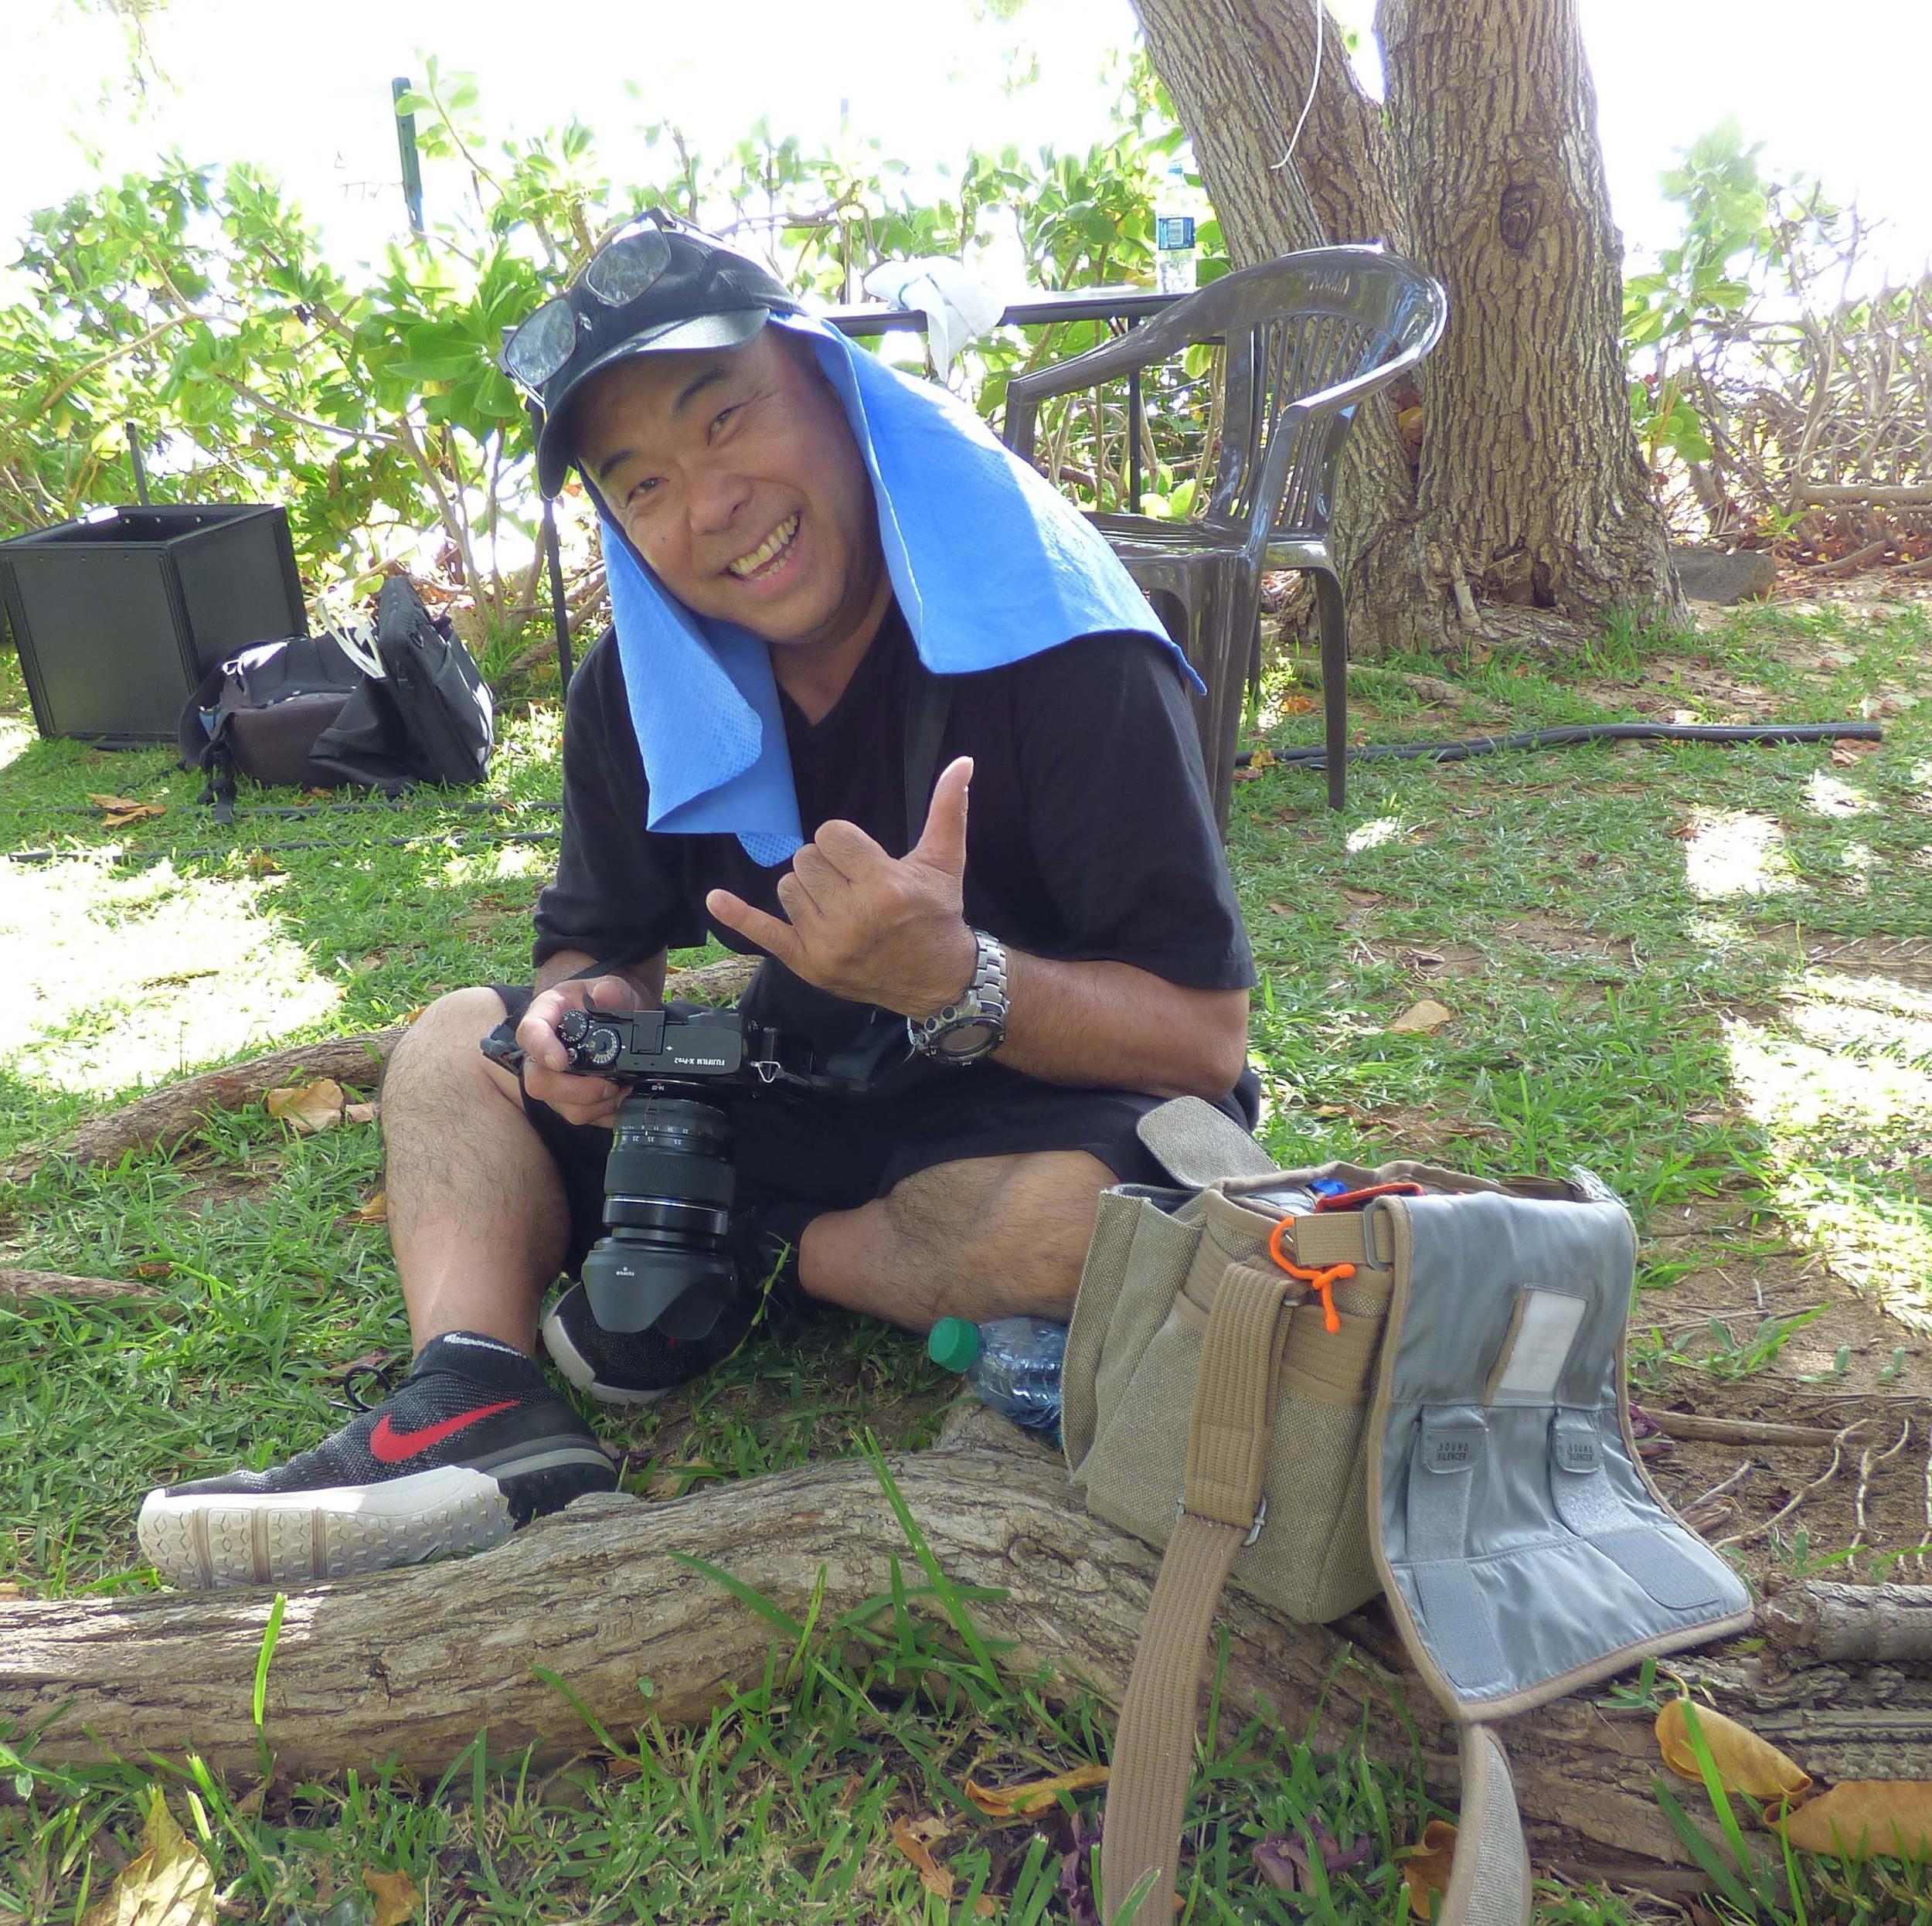 On set of Cooking Hawaiian Style Season 6. 1 of the rare images of myself...ever! PC: Thank you,Yolanda Santos.